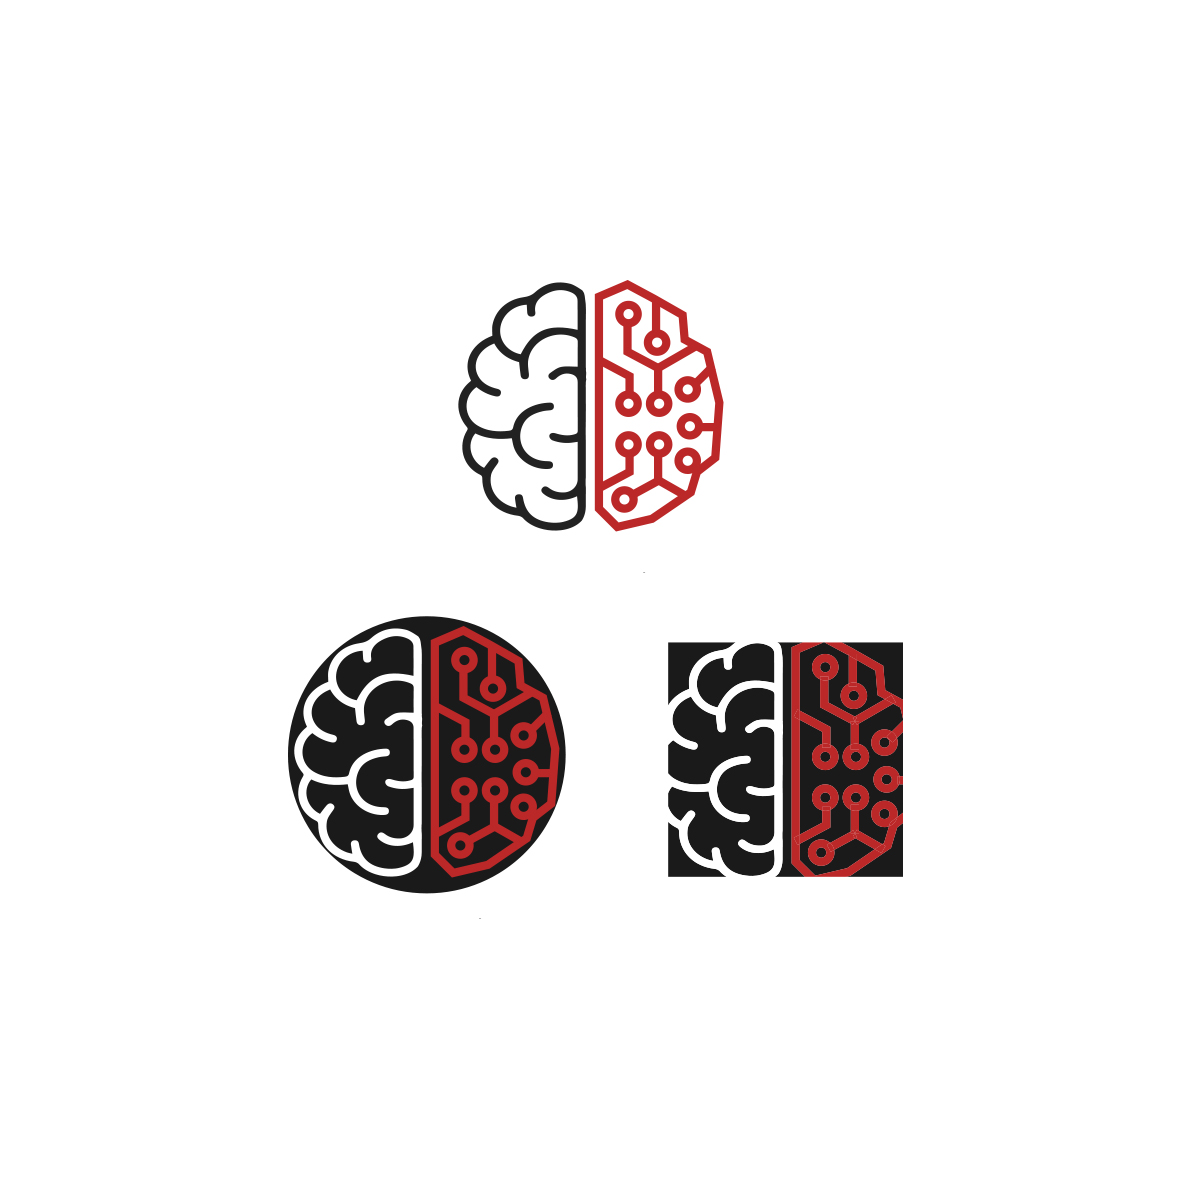 Разработать логотип для Онлайн-школы и сообщества фото f_2145bc5e1c04a47a.jpg